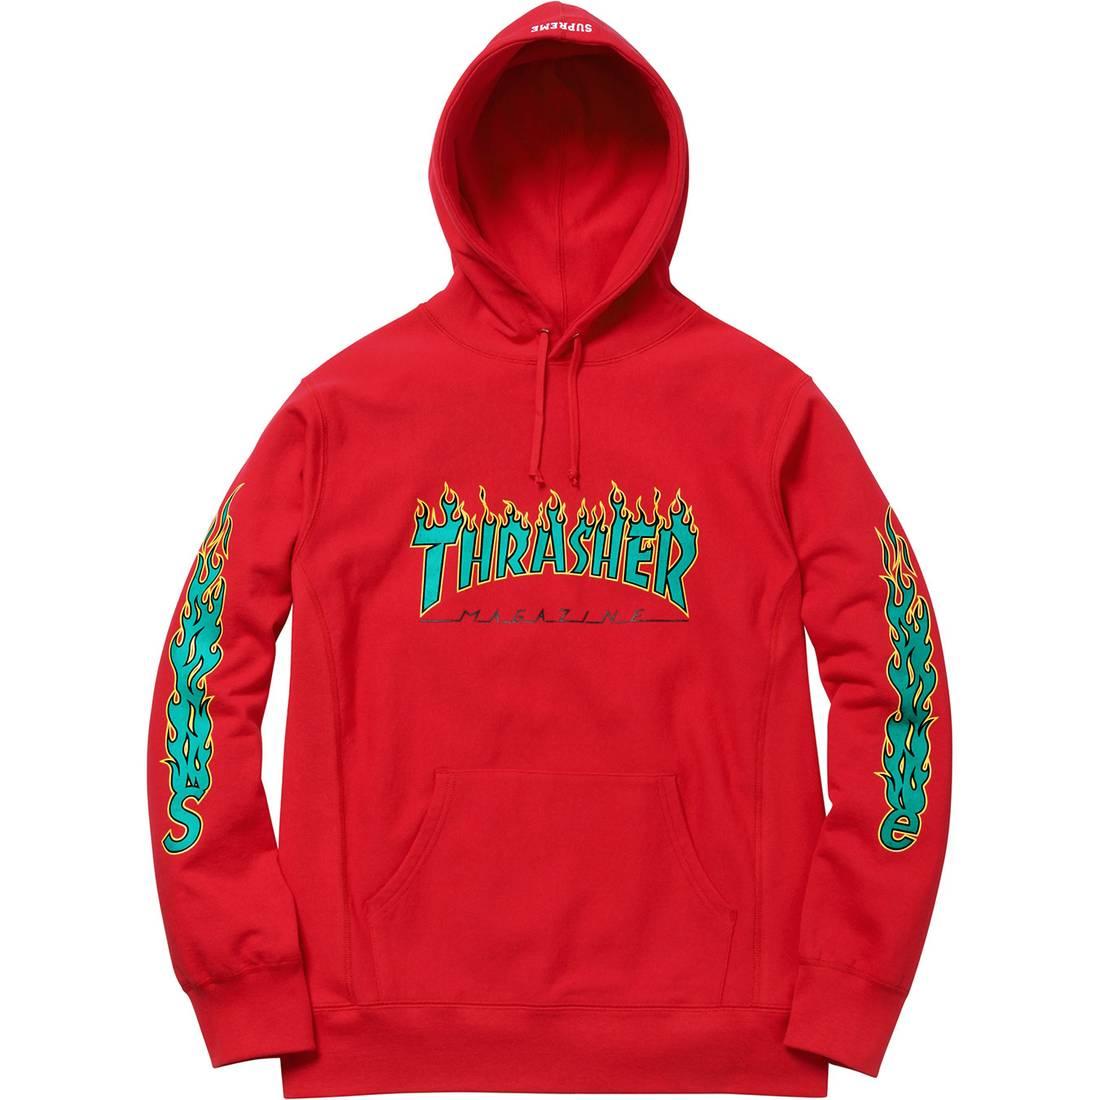 Supreme Supreme/Thrasher® Hoodie - Red Size m - Sweatshirts ...